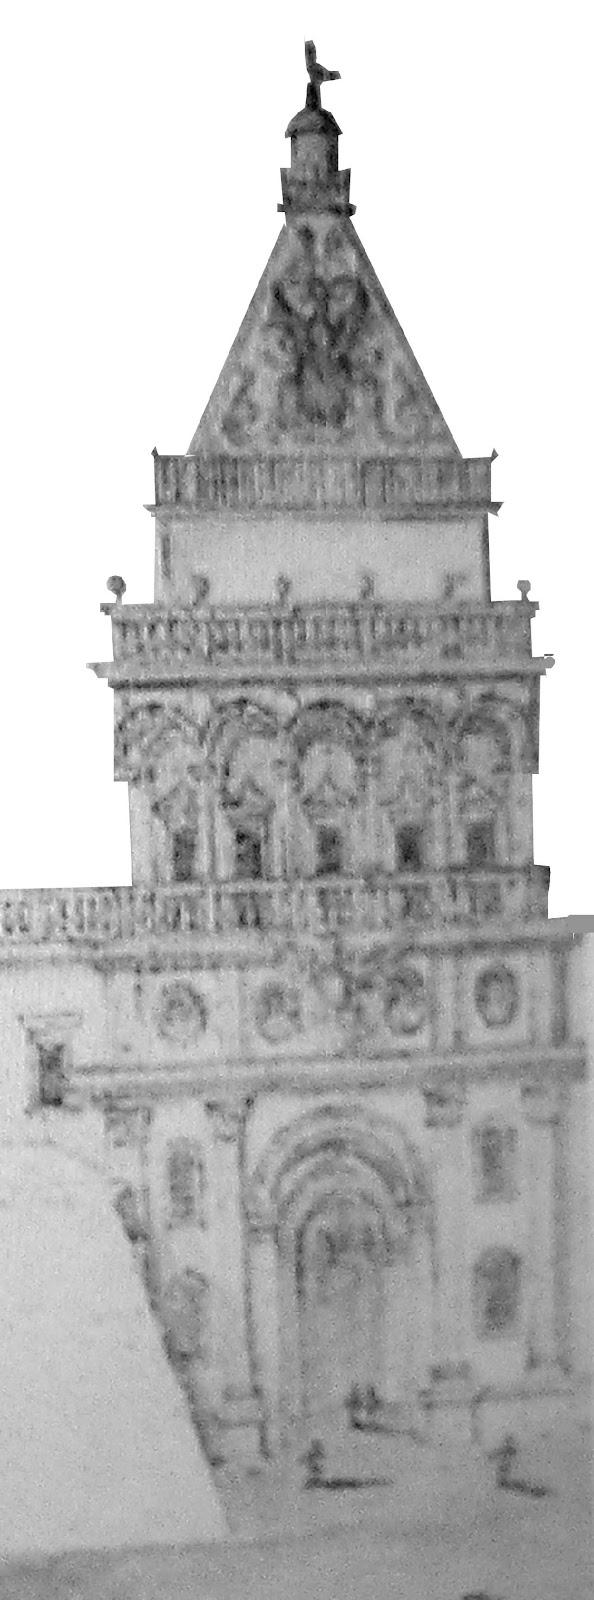 Palazzo reale Palermo 035